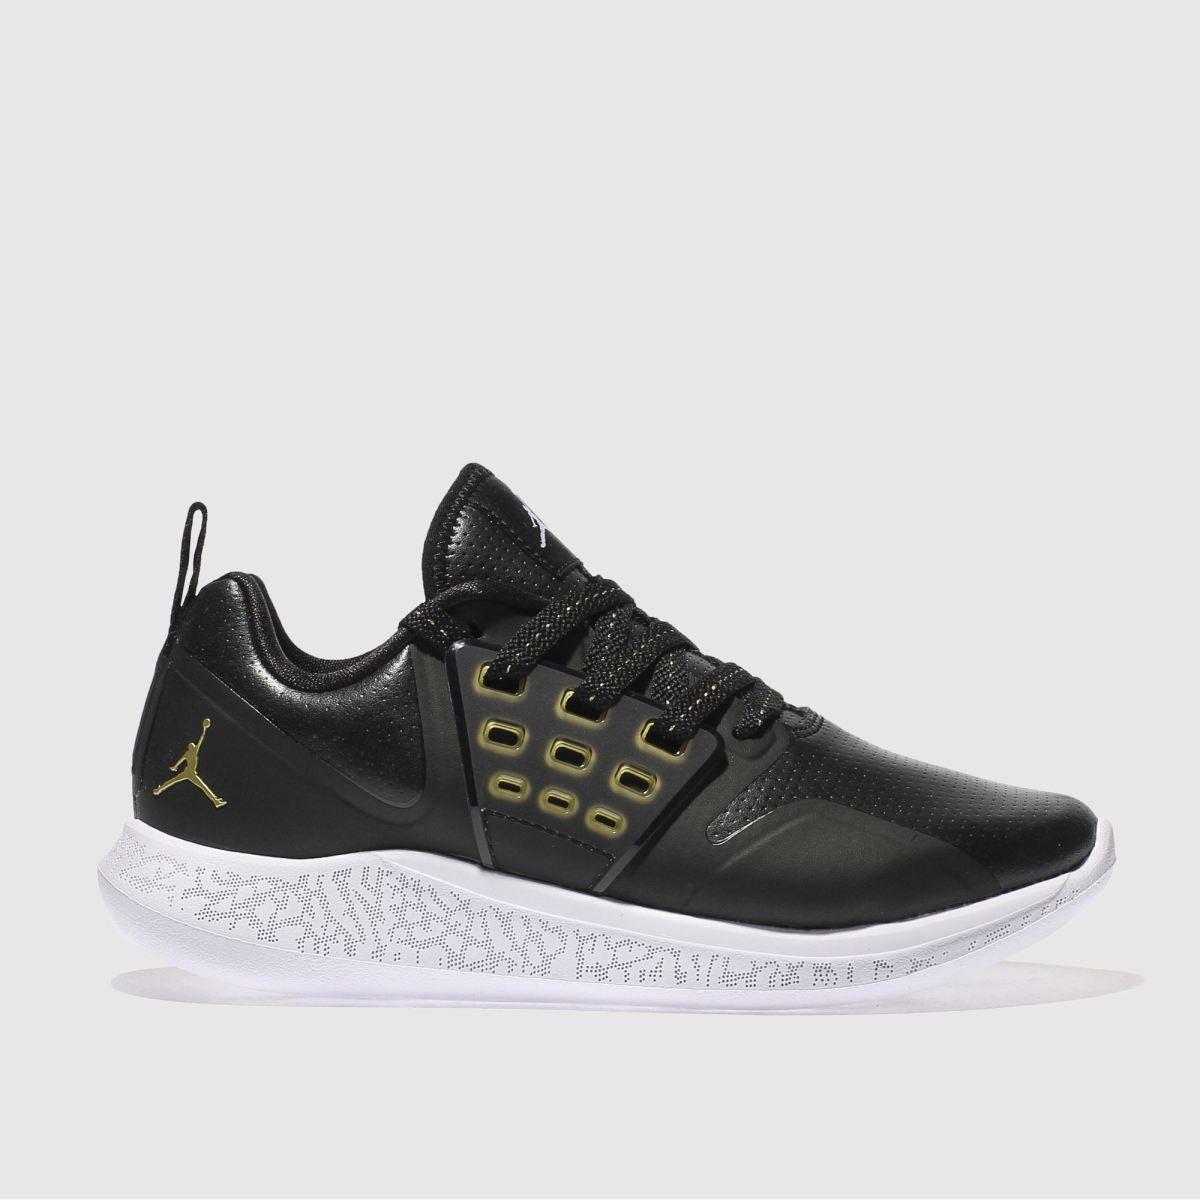 Nike Jordan Black & Gold Grind Youth Trainers